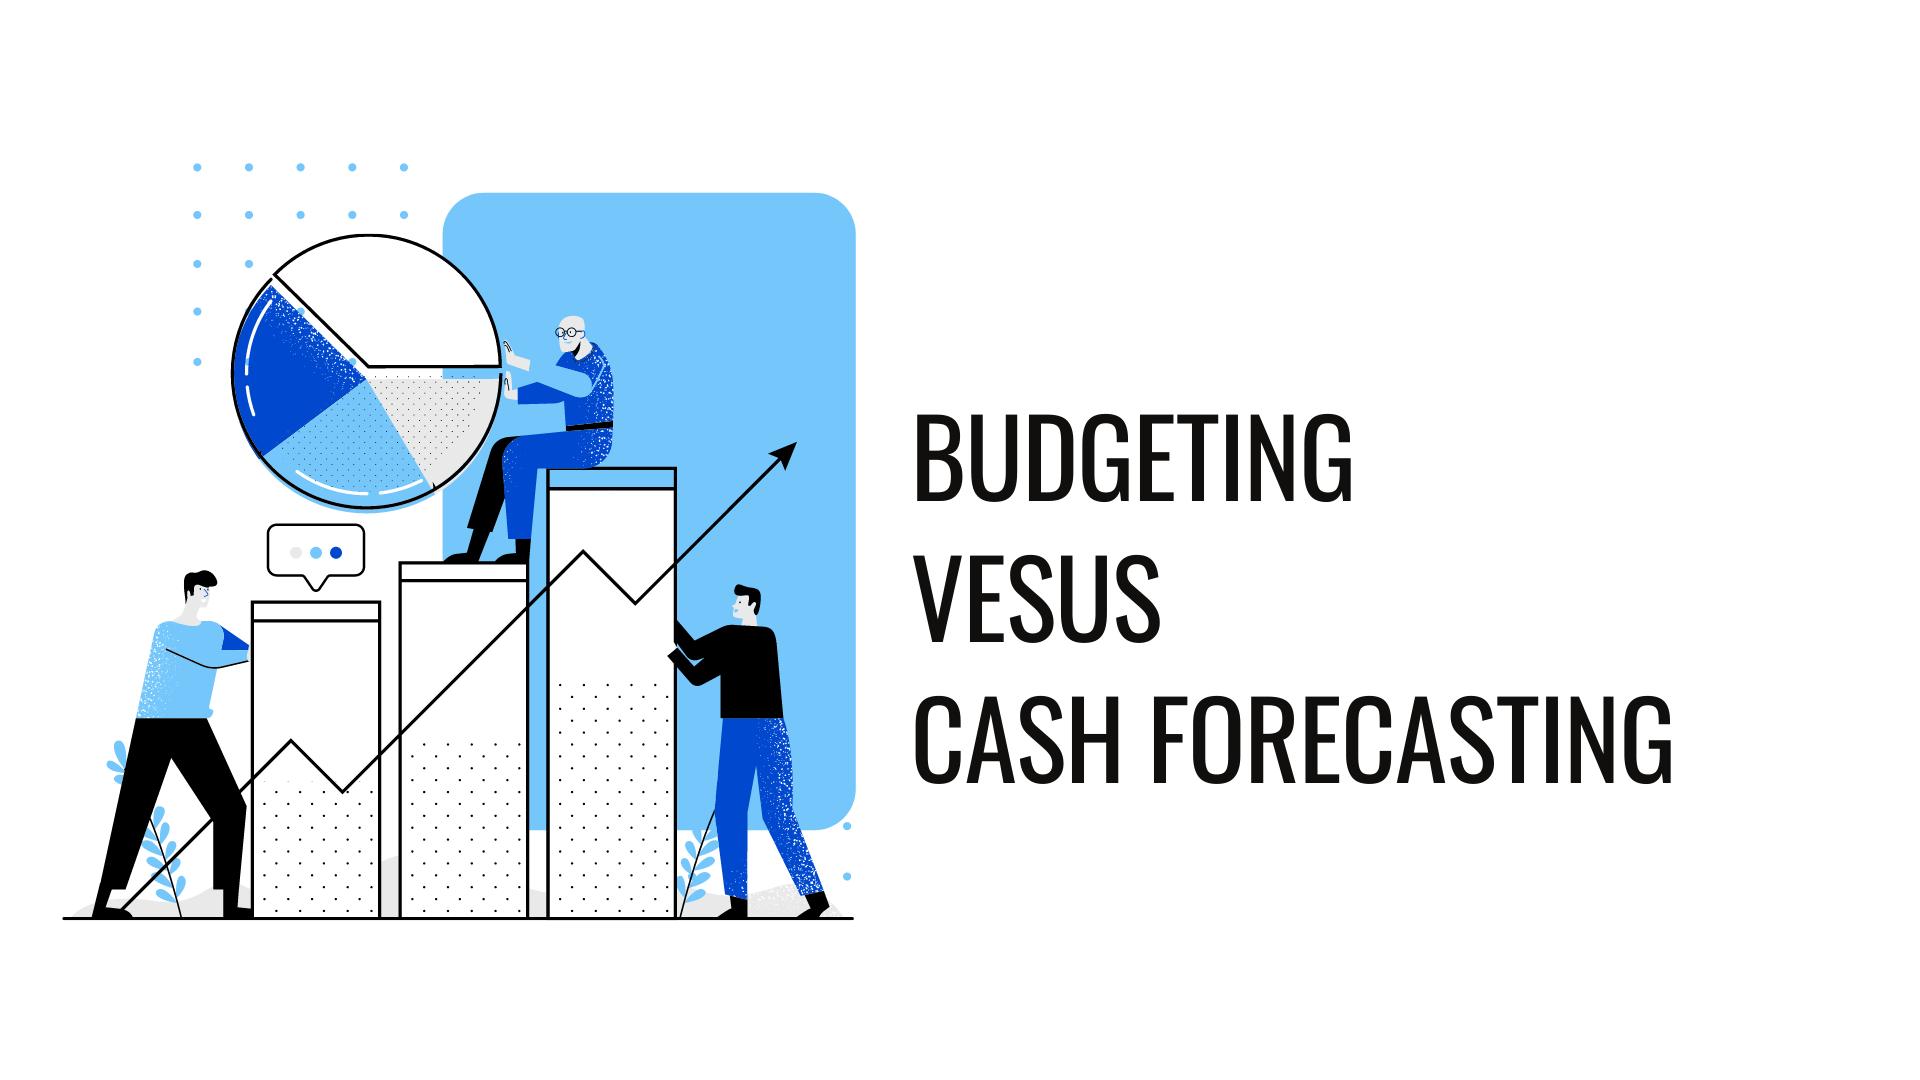 Budgeting versus forecasting